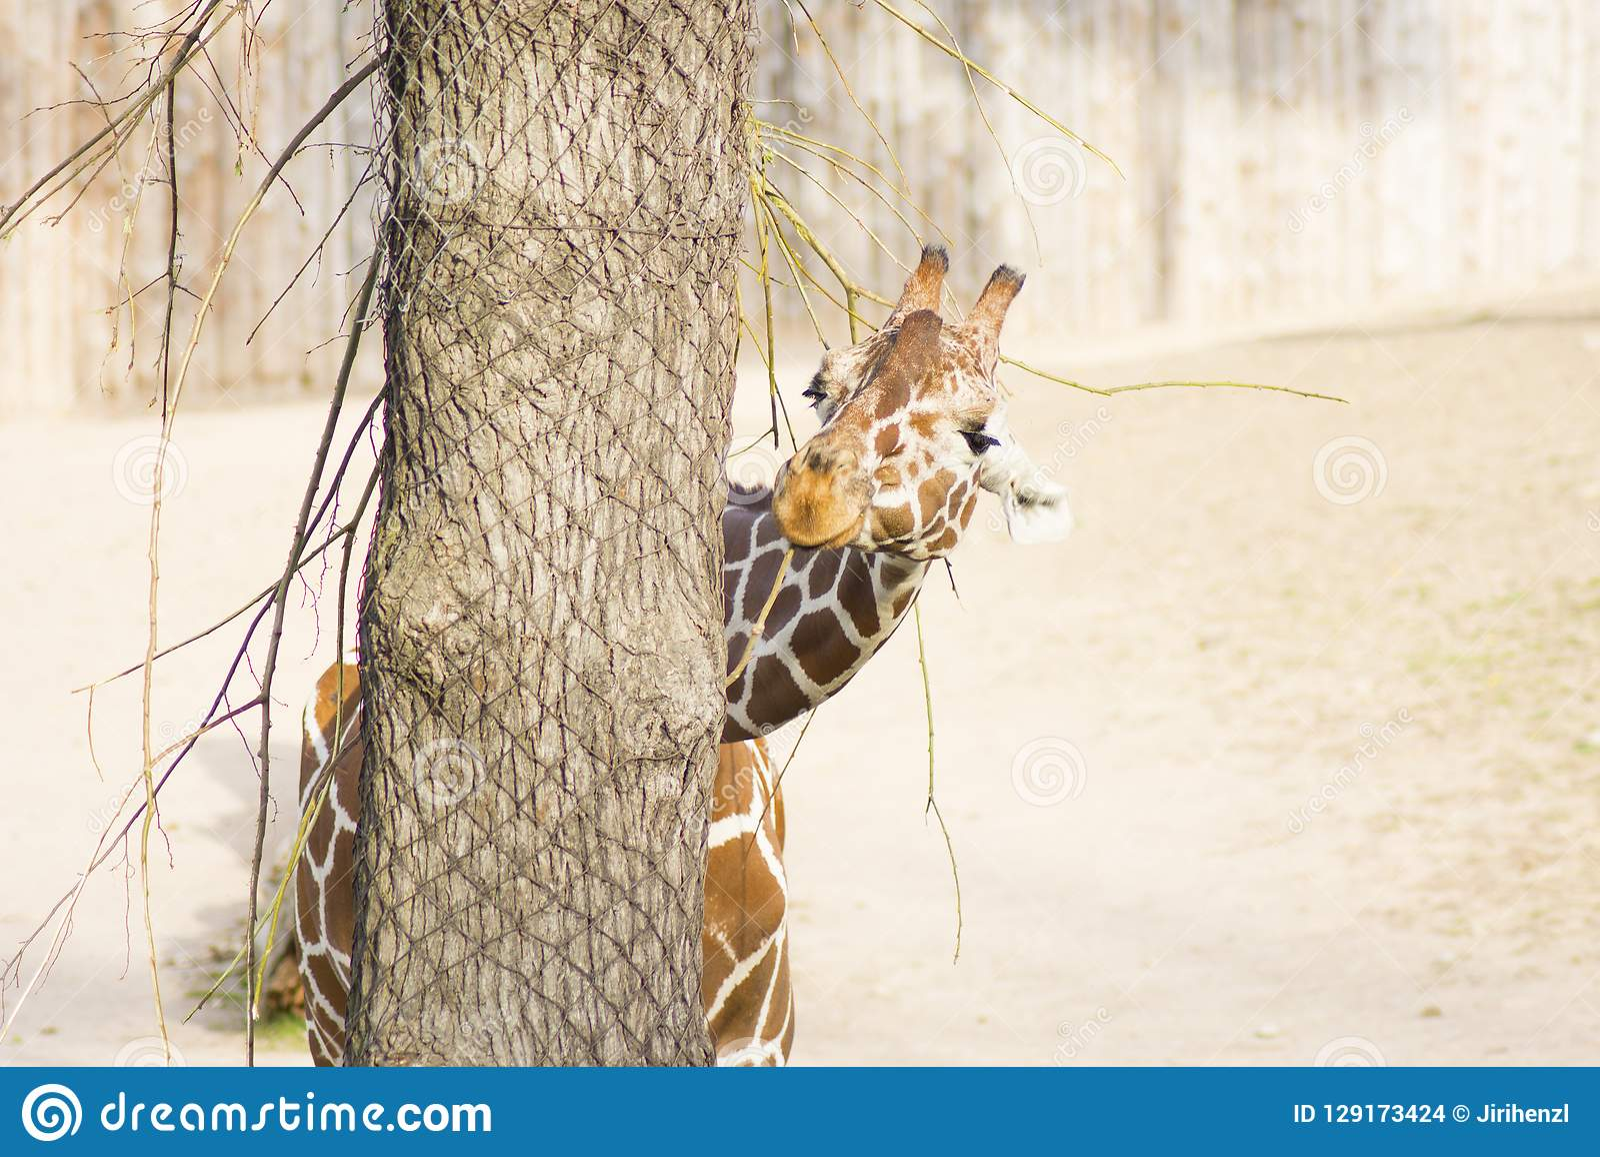 Young funny giraffe